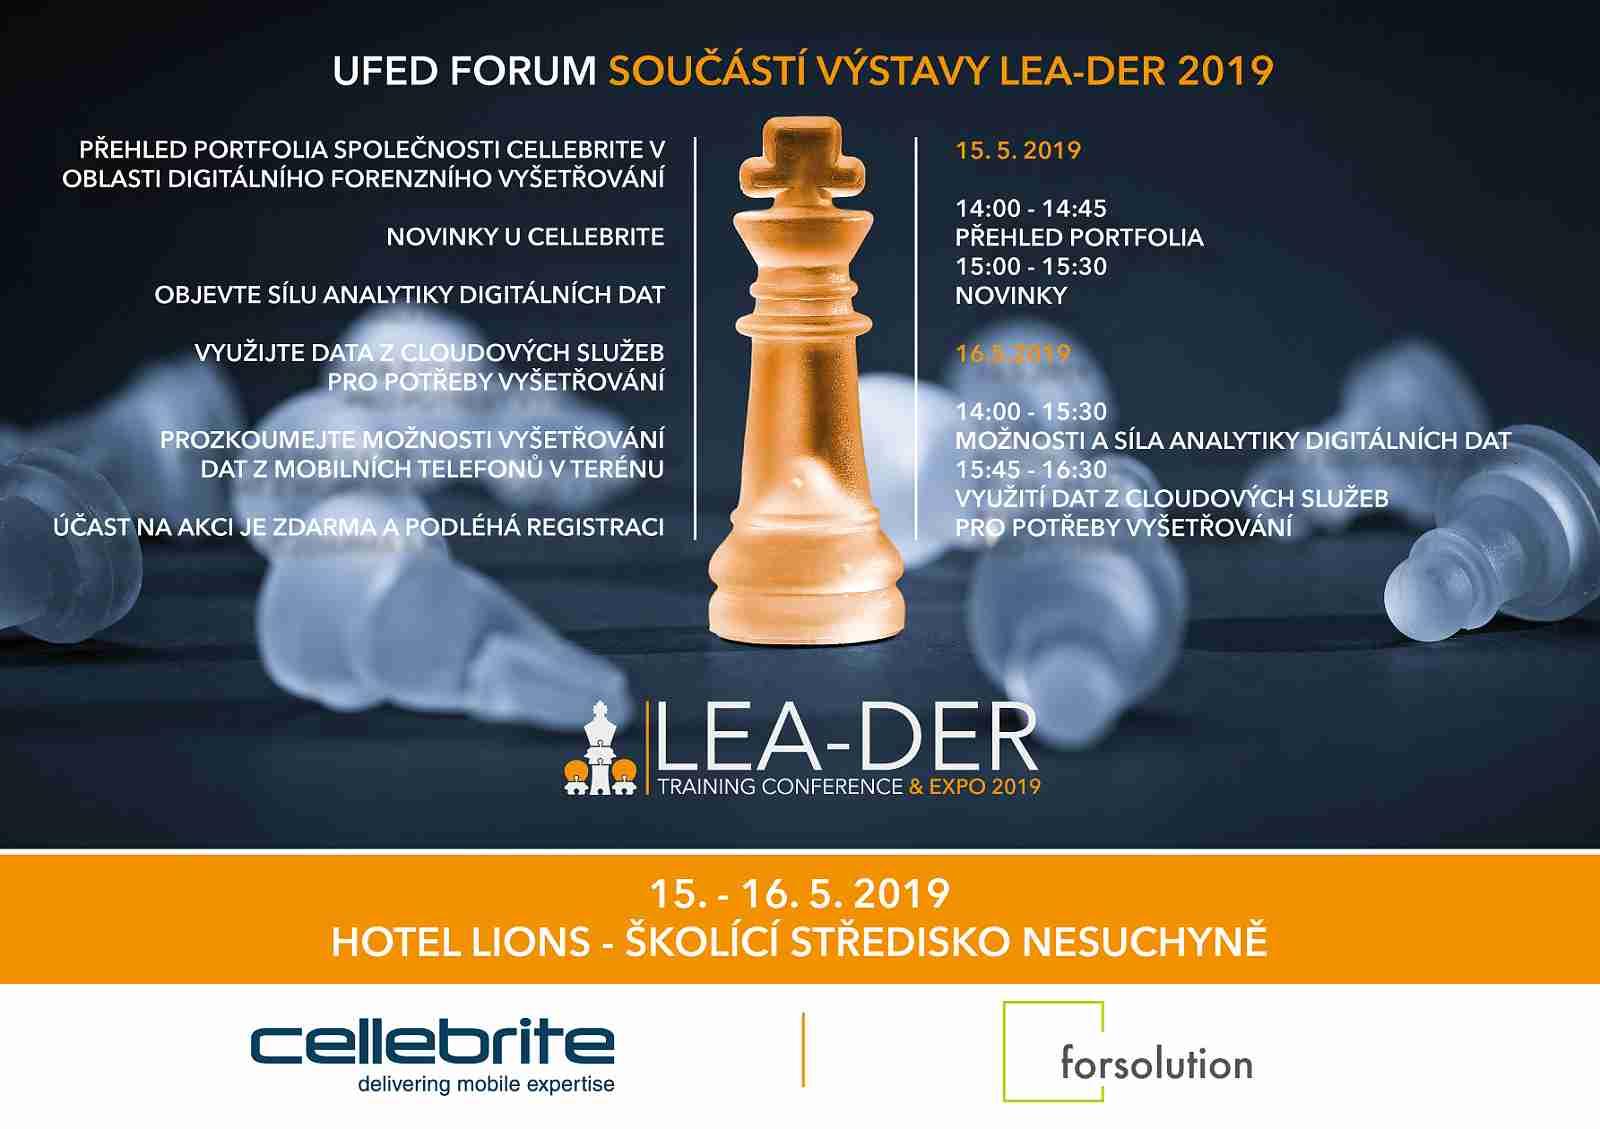 ufed_forum_leader